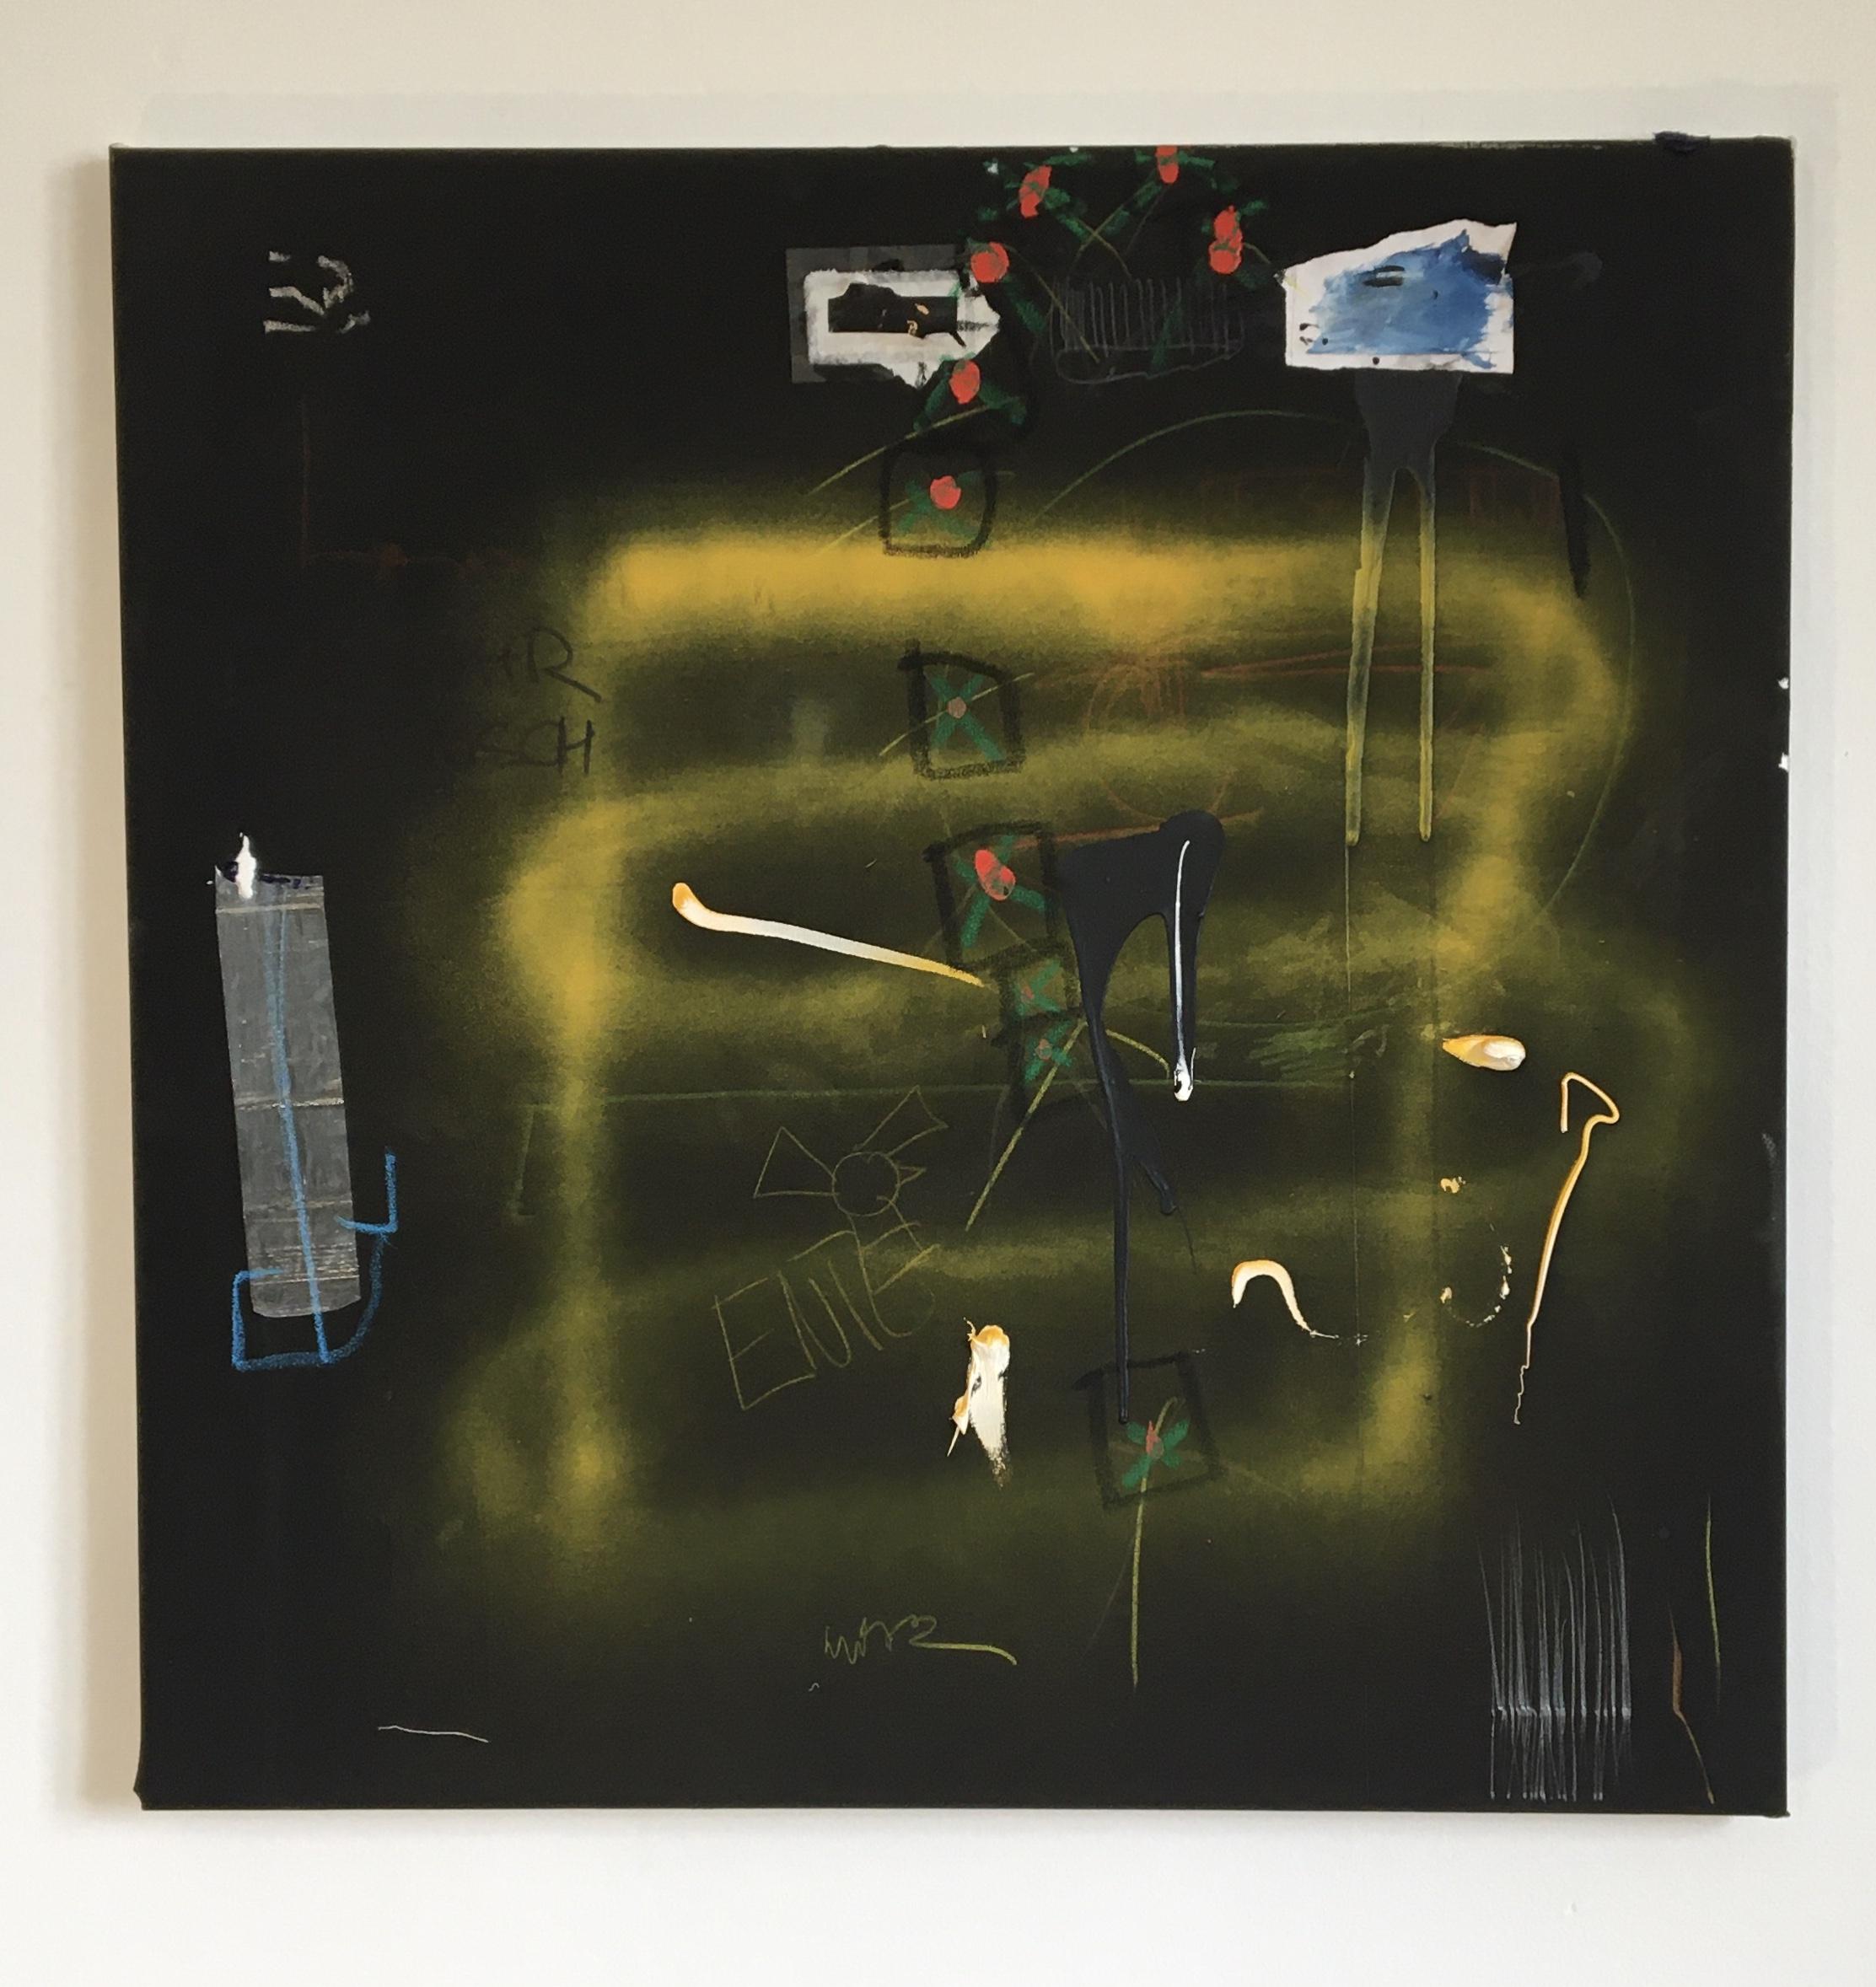 PNIK - kl, 2021, Mixed Media on canvas, 75 x 75 cm / 29.5 x  29.5 in